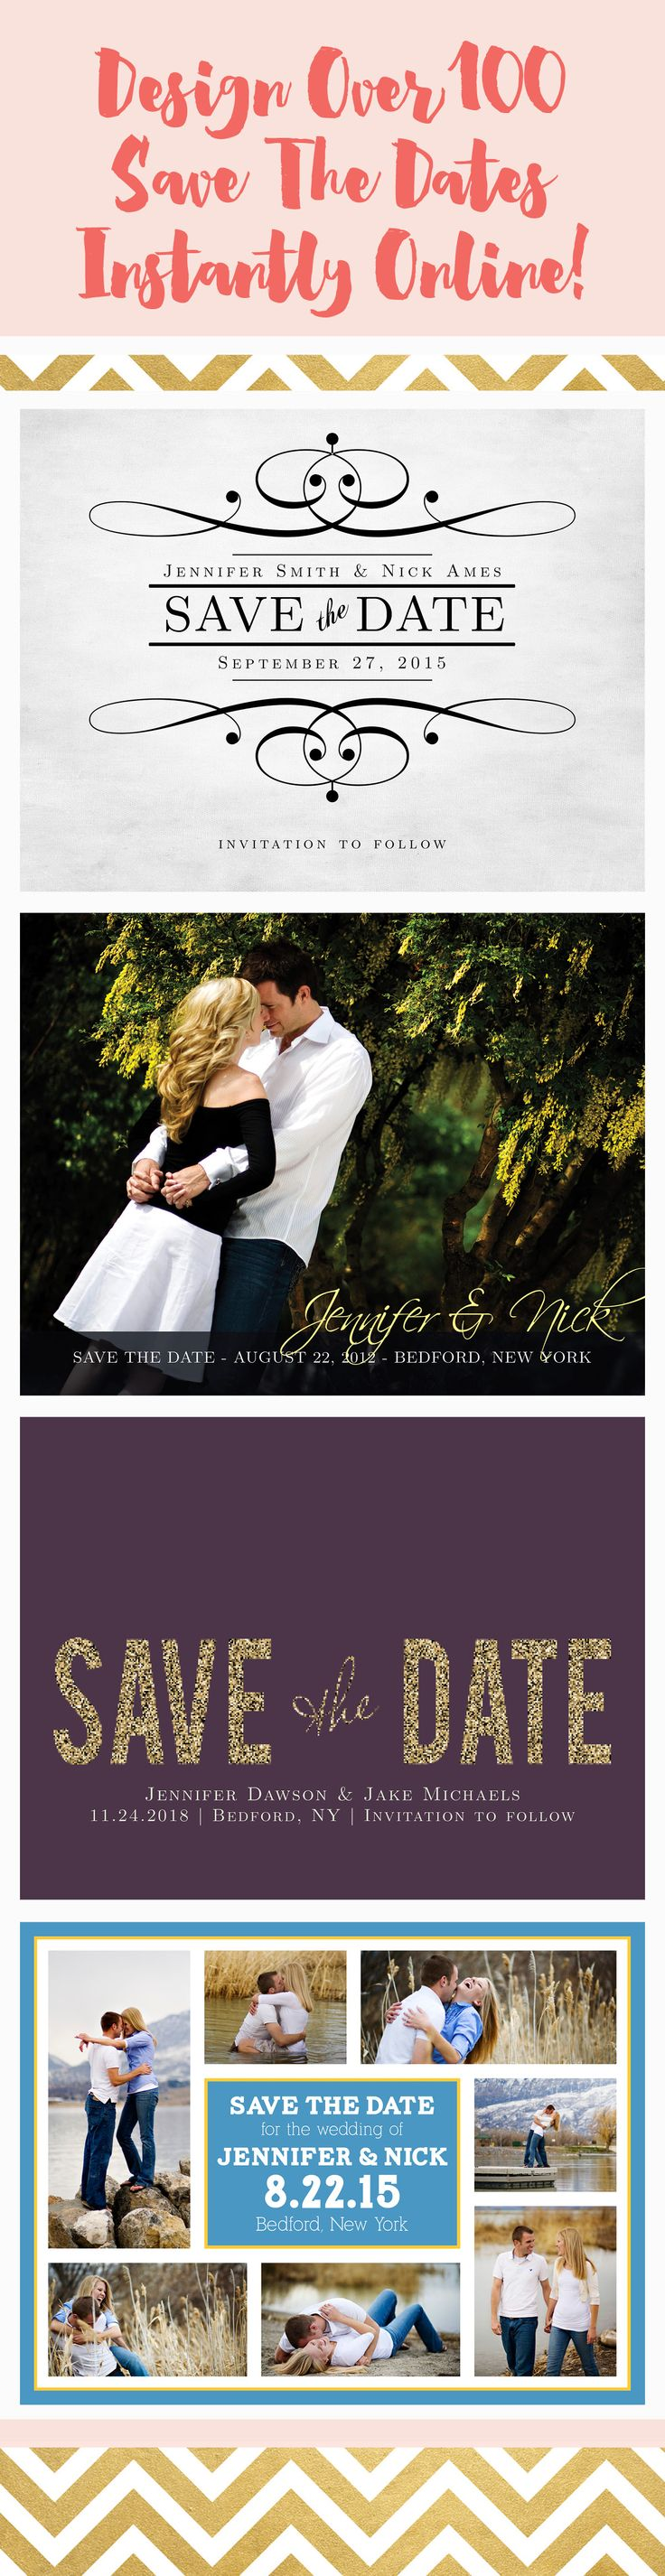 best wedding planning images on pinterest weddings wedding